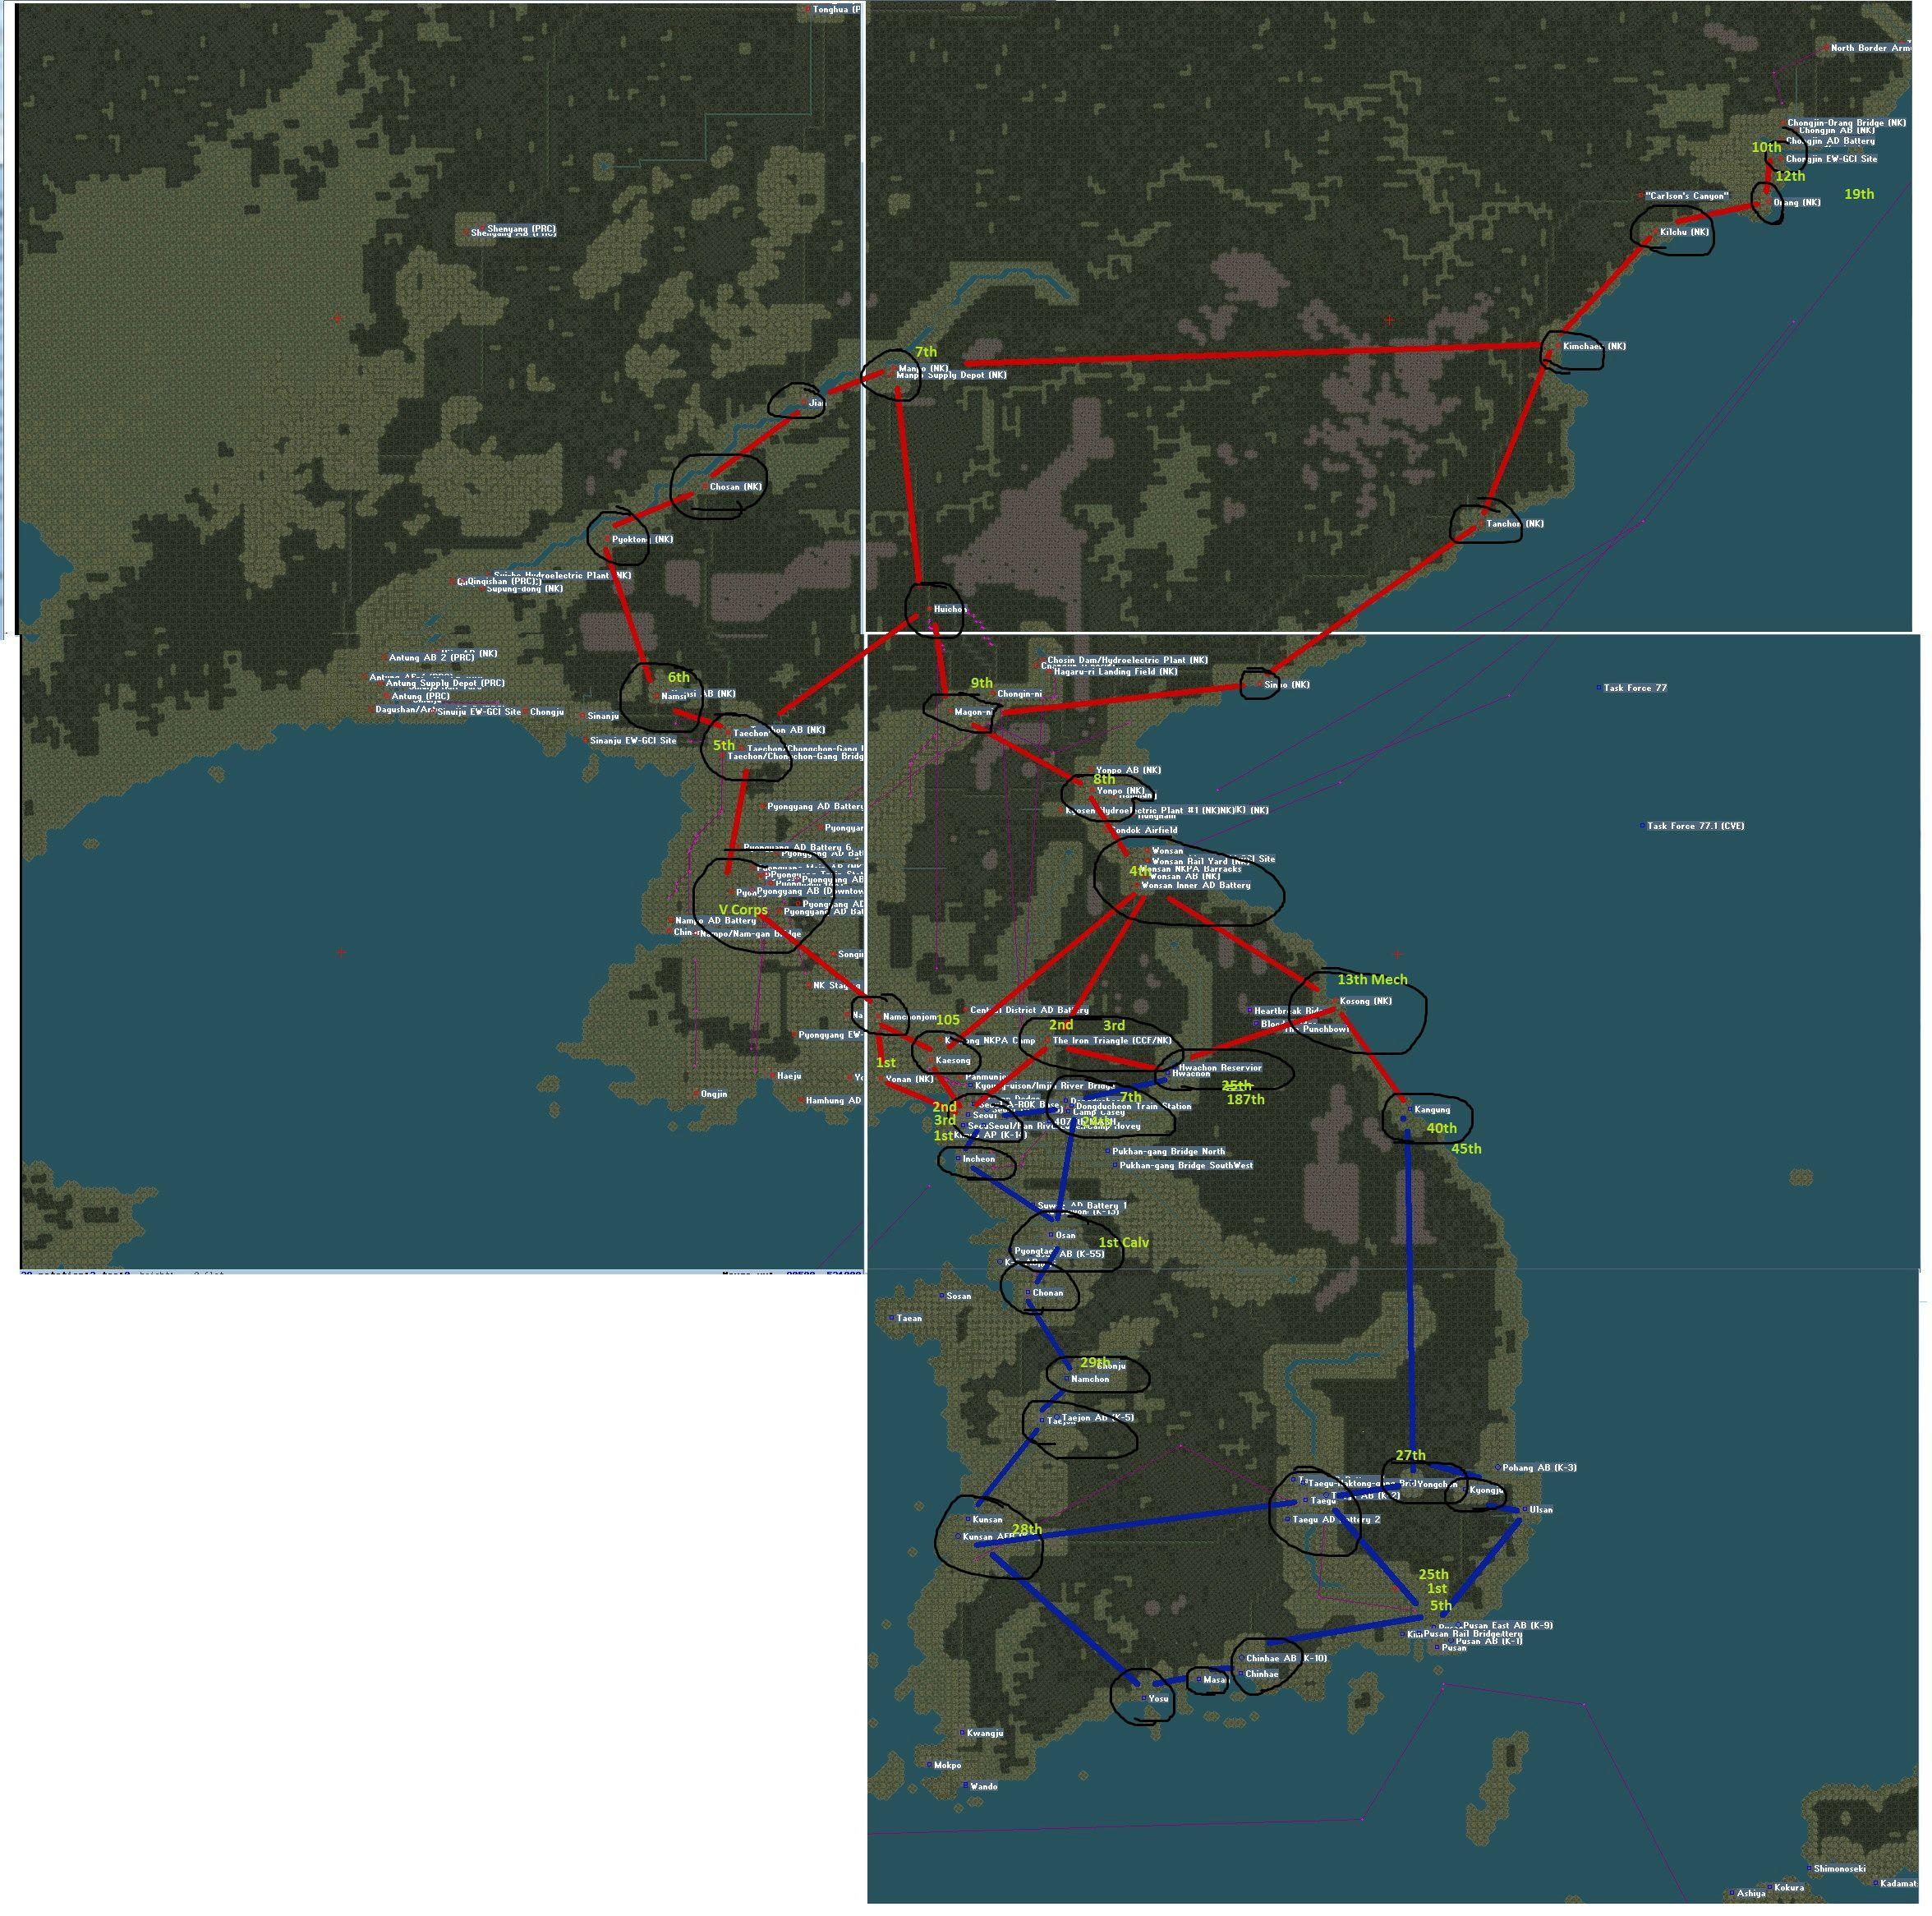 Need some help with campaign/ground war - Thirdwire: Strike